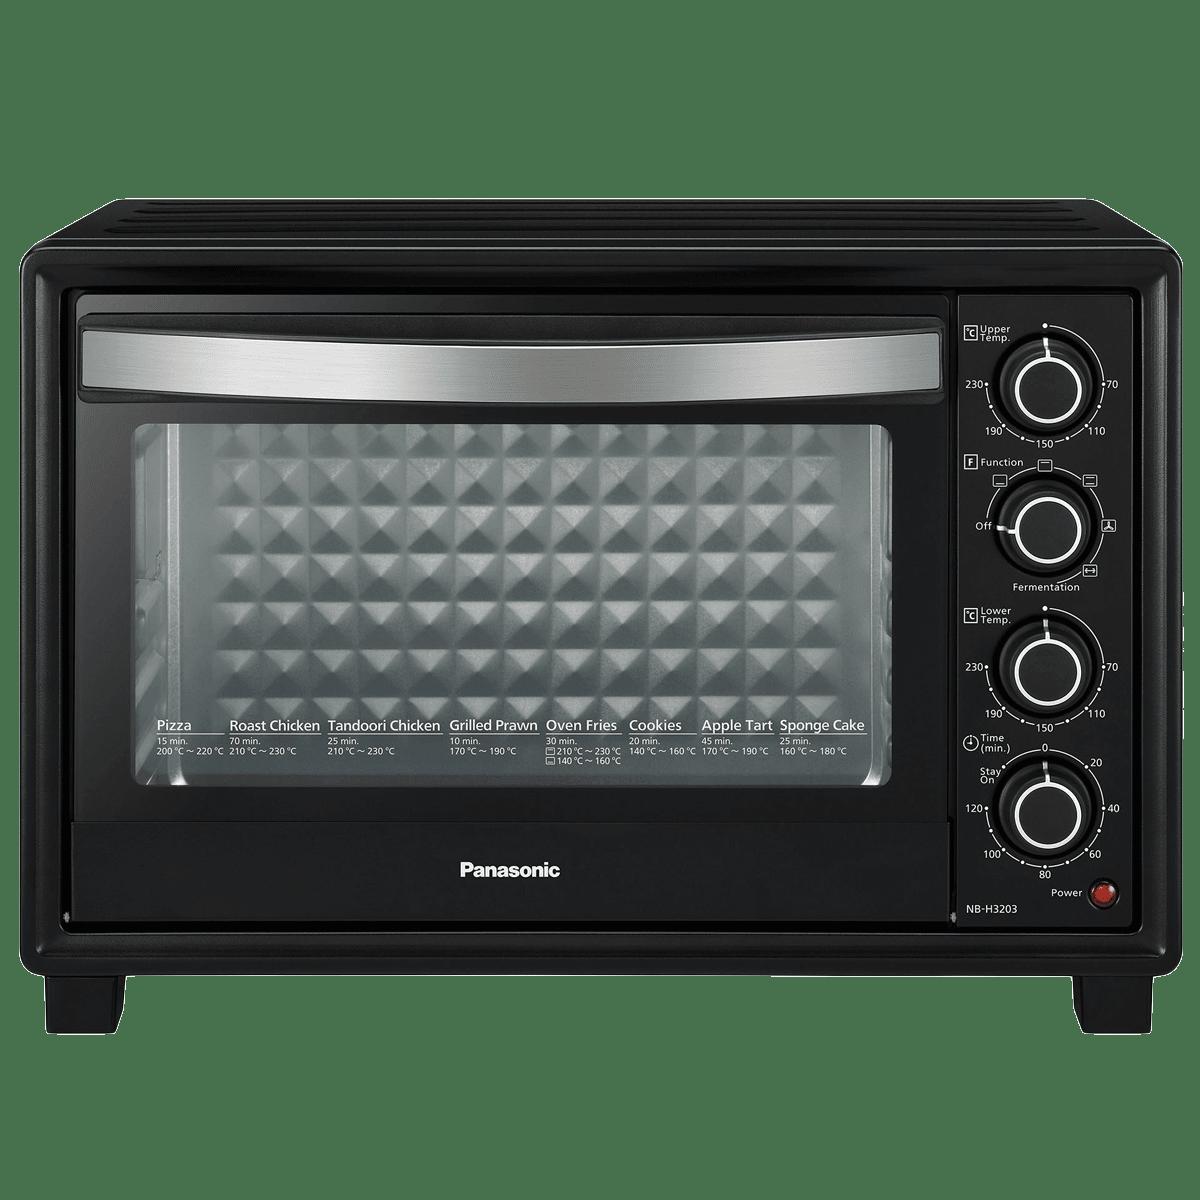 Panasonic 32 Litres OTG (Fermentation Function, NB-3203KSM, Black)